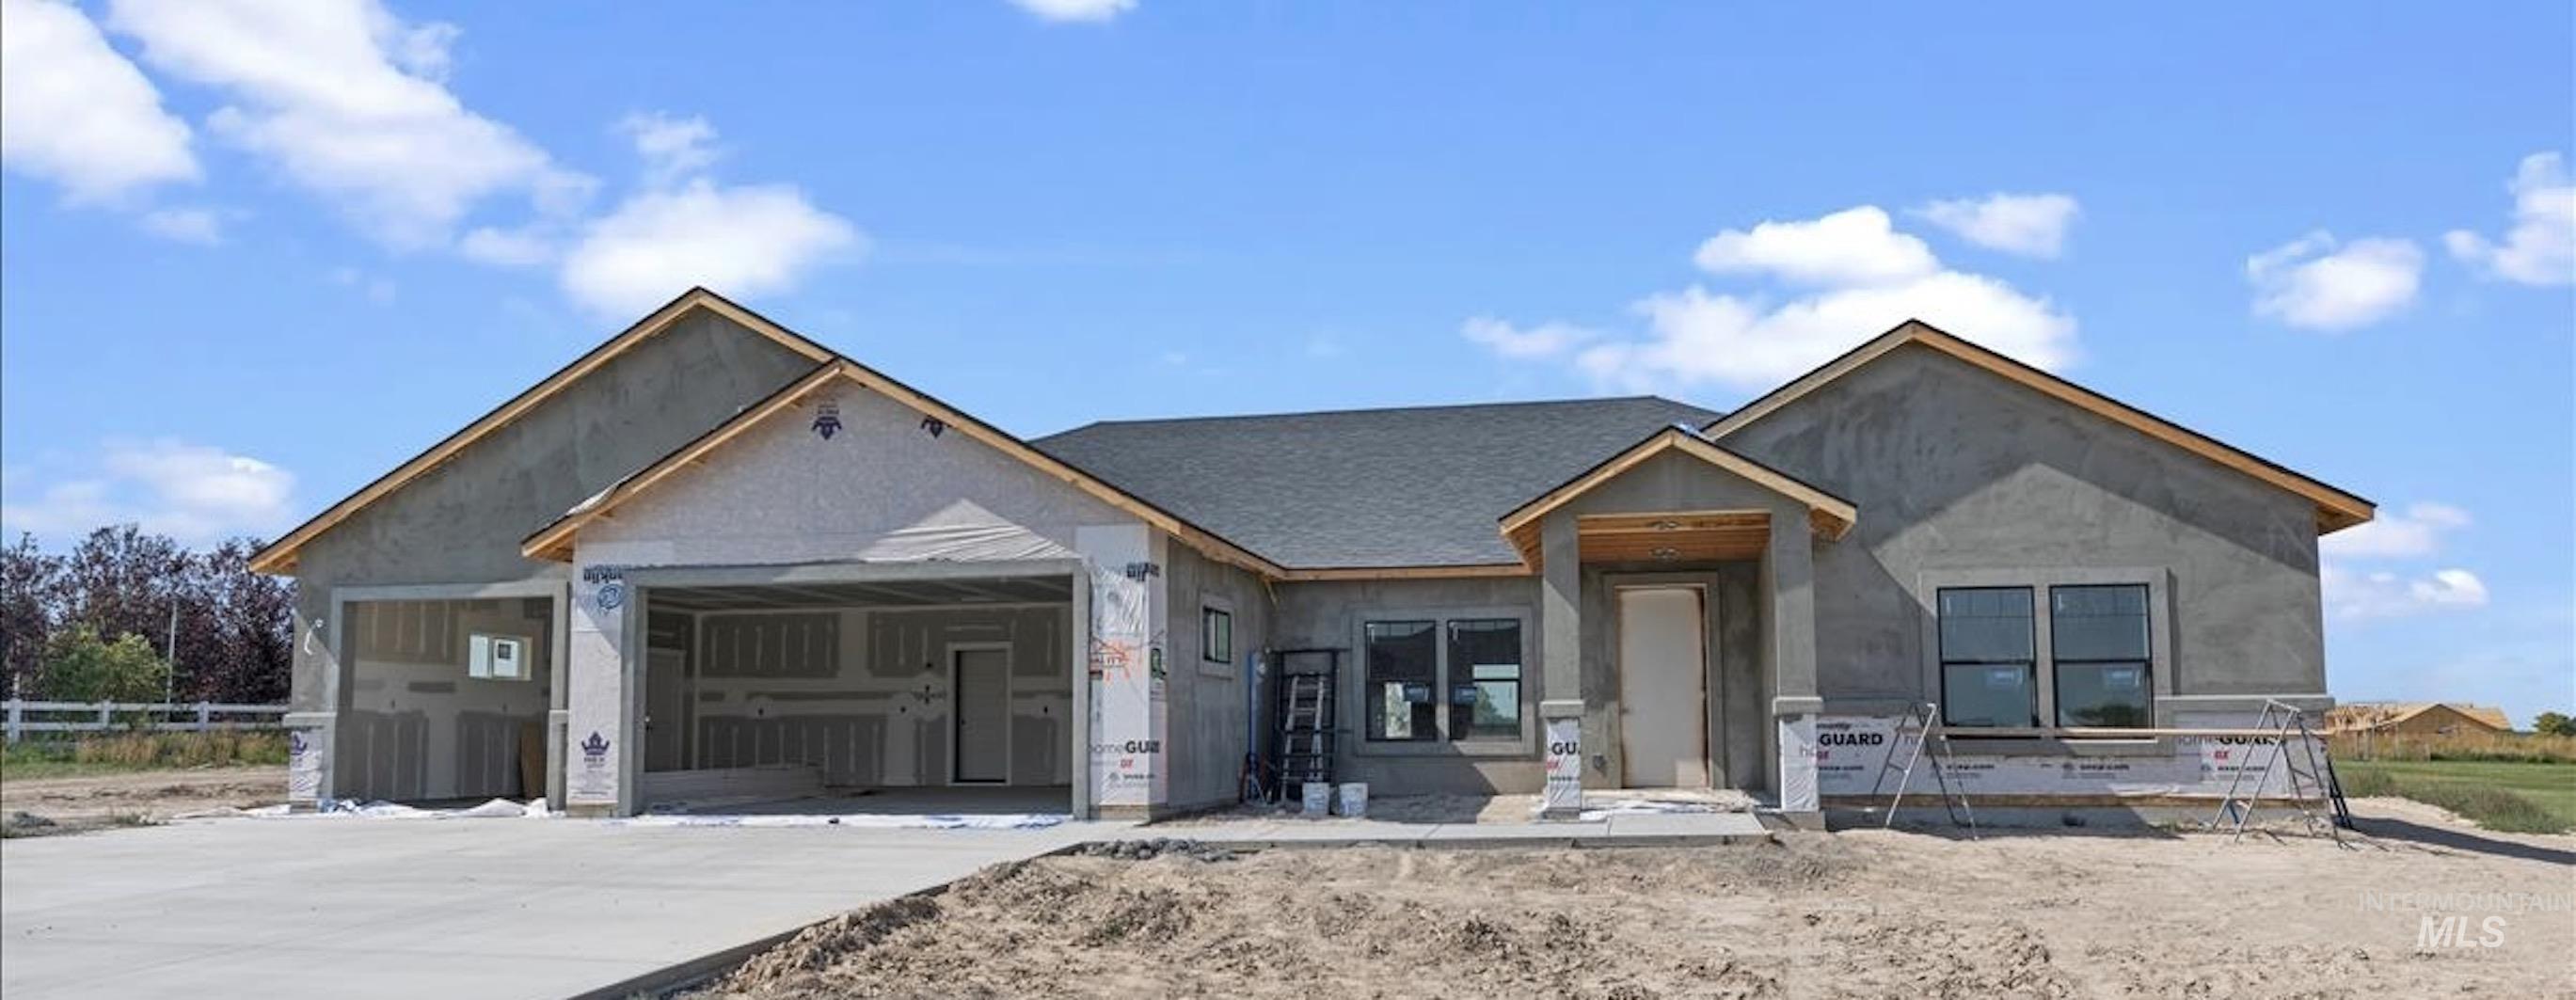 3741 N 2481 E Property Photo 1